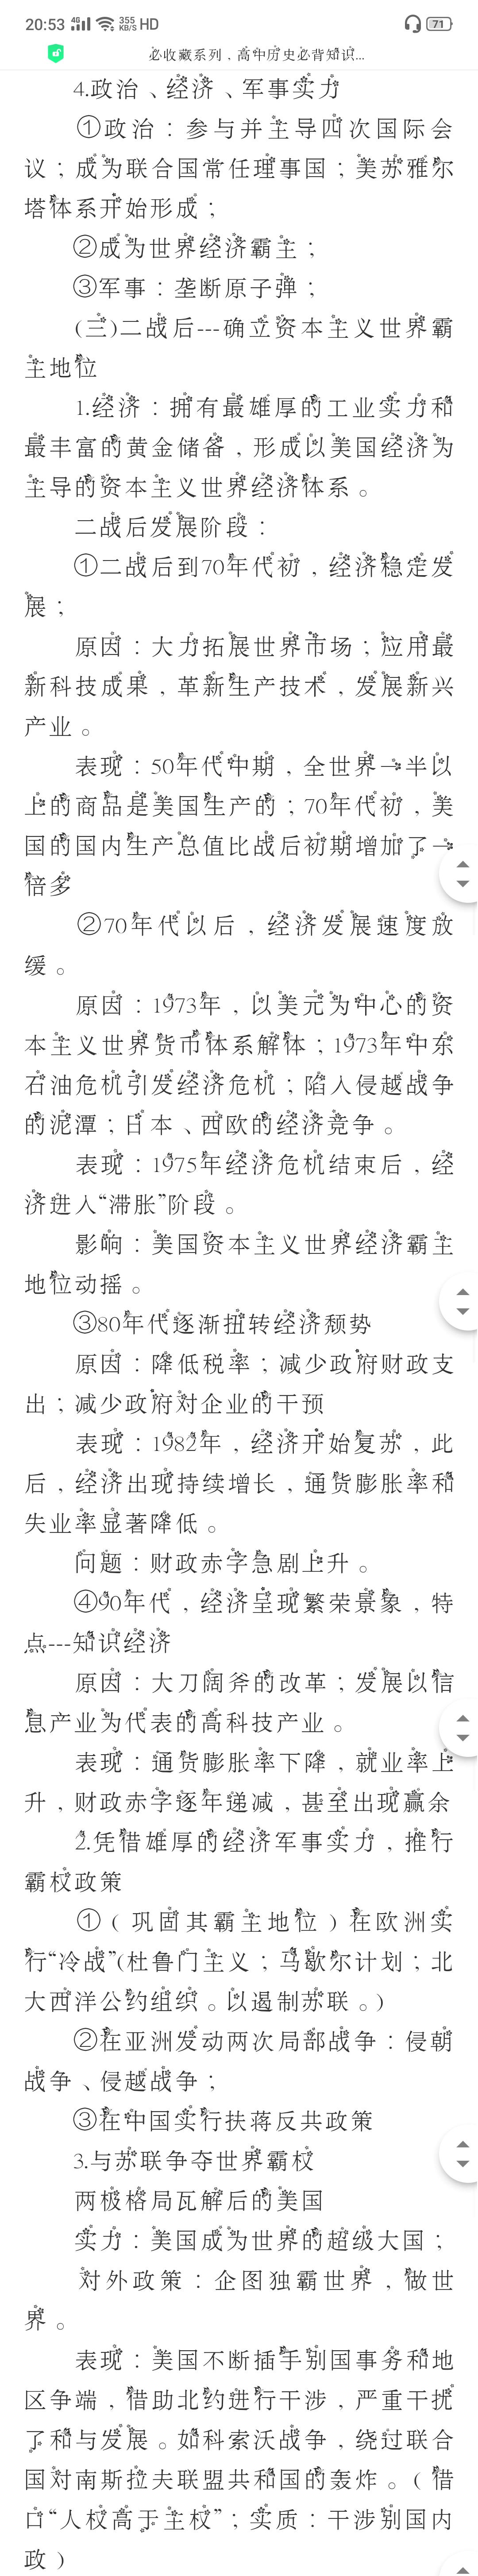 Screenshot_2019-07-26-20-53-22-72.png